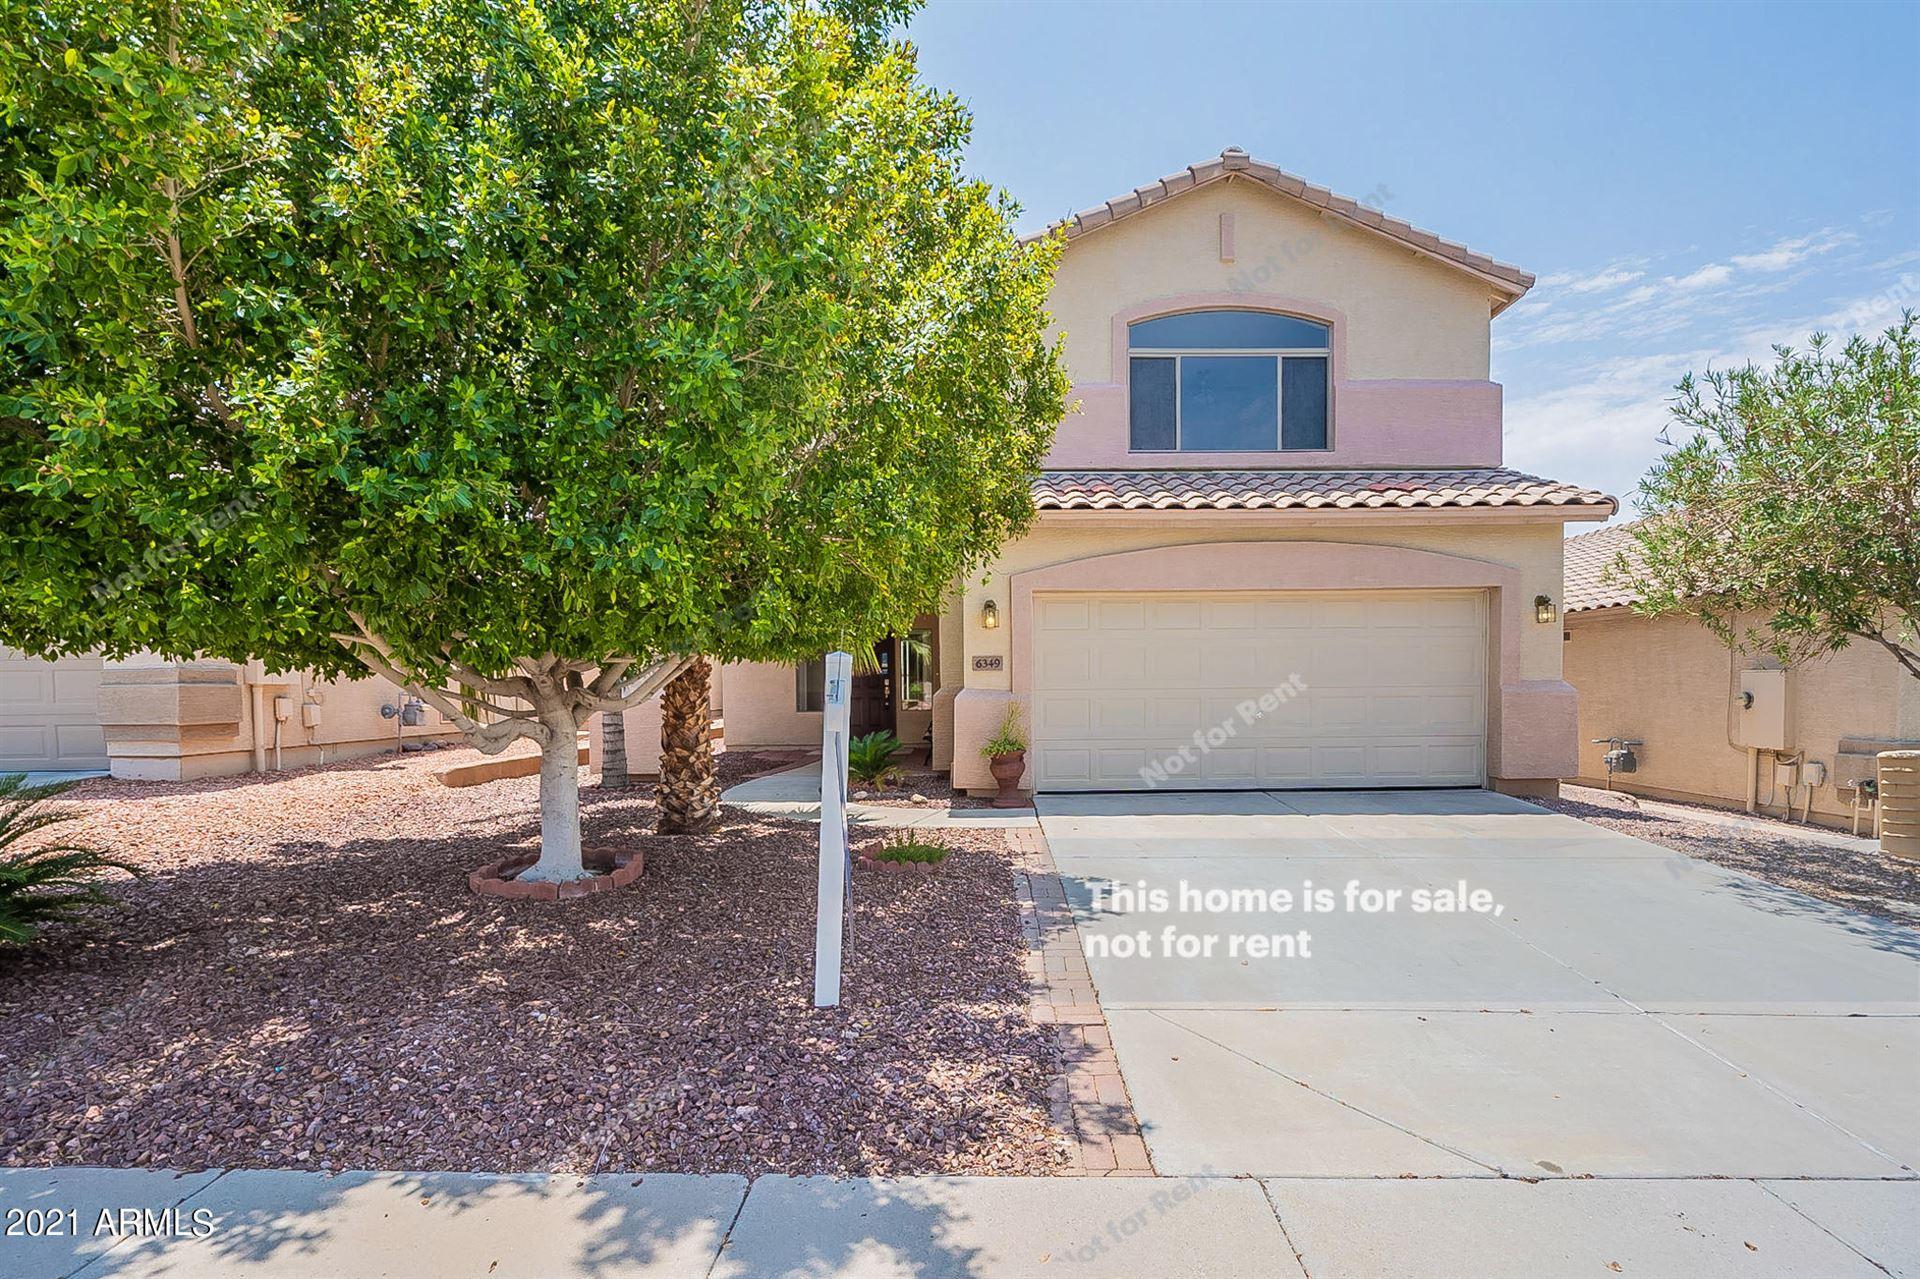 6349 W DESERT HOLLOW Drive, Phoenix, AZ 85083 - MLS#: 6268214